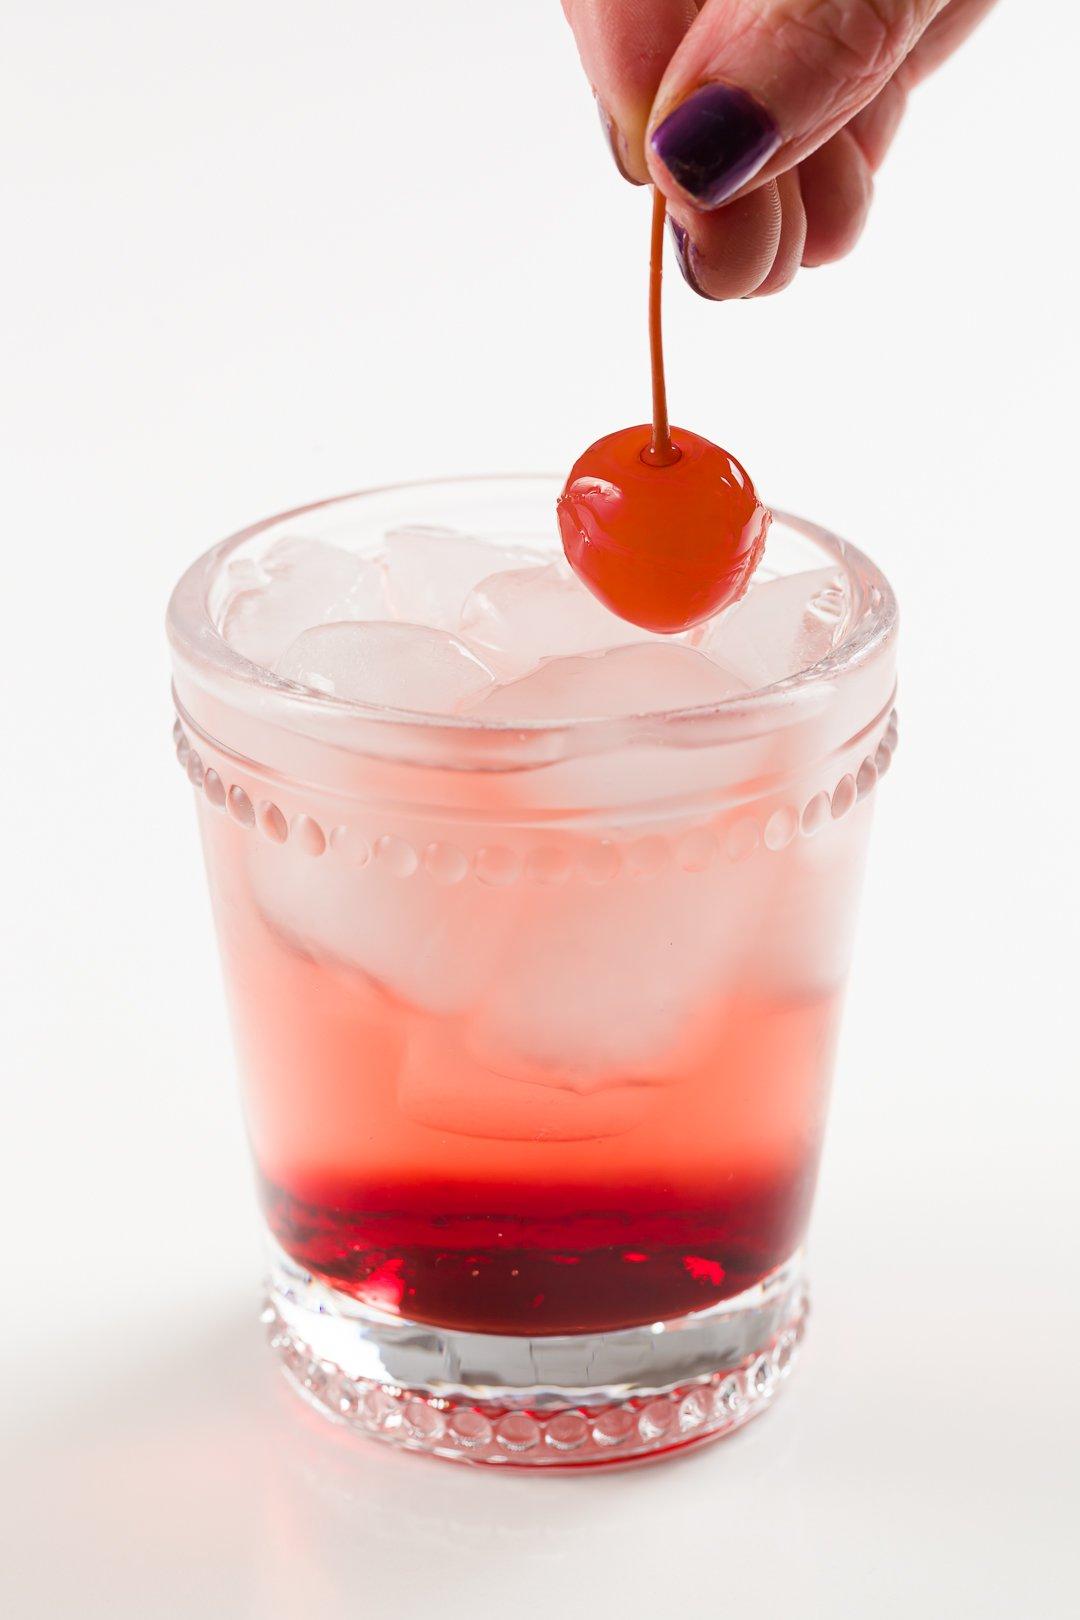 placing a Maraschino cherry into a Shirley Temple non-alcoholic cocktail